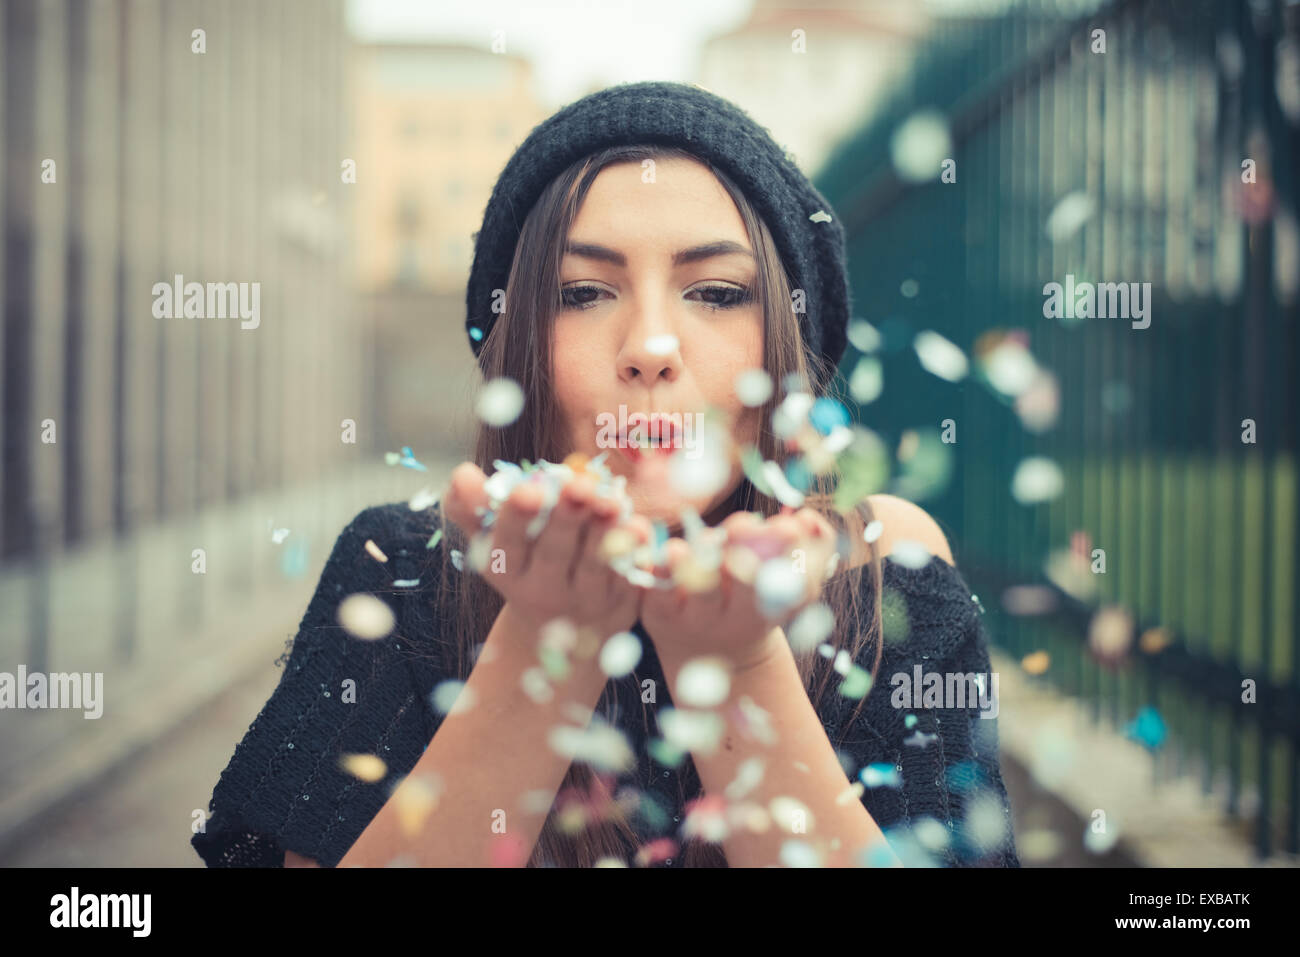 junge schöne Brünette Frau Mädchen im freien Stockbild